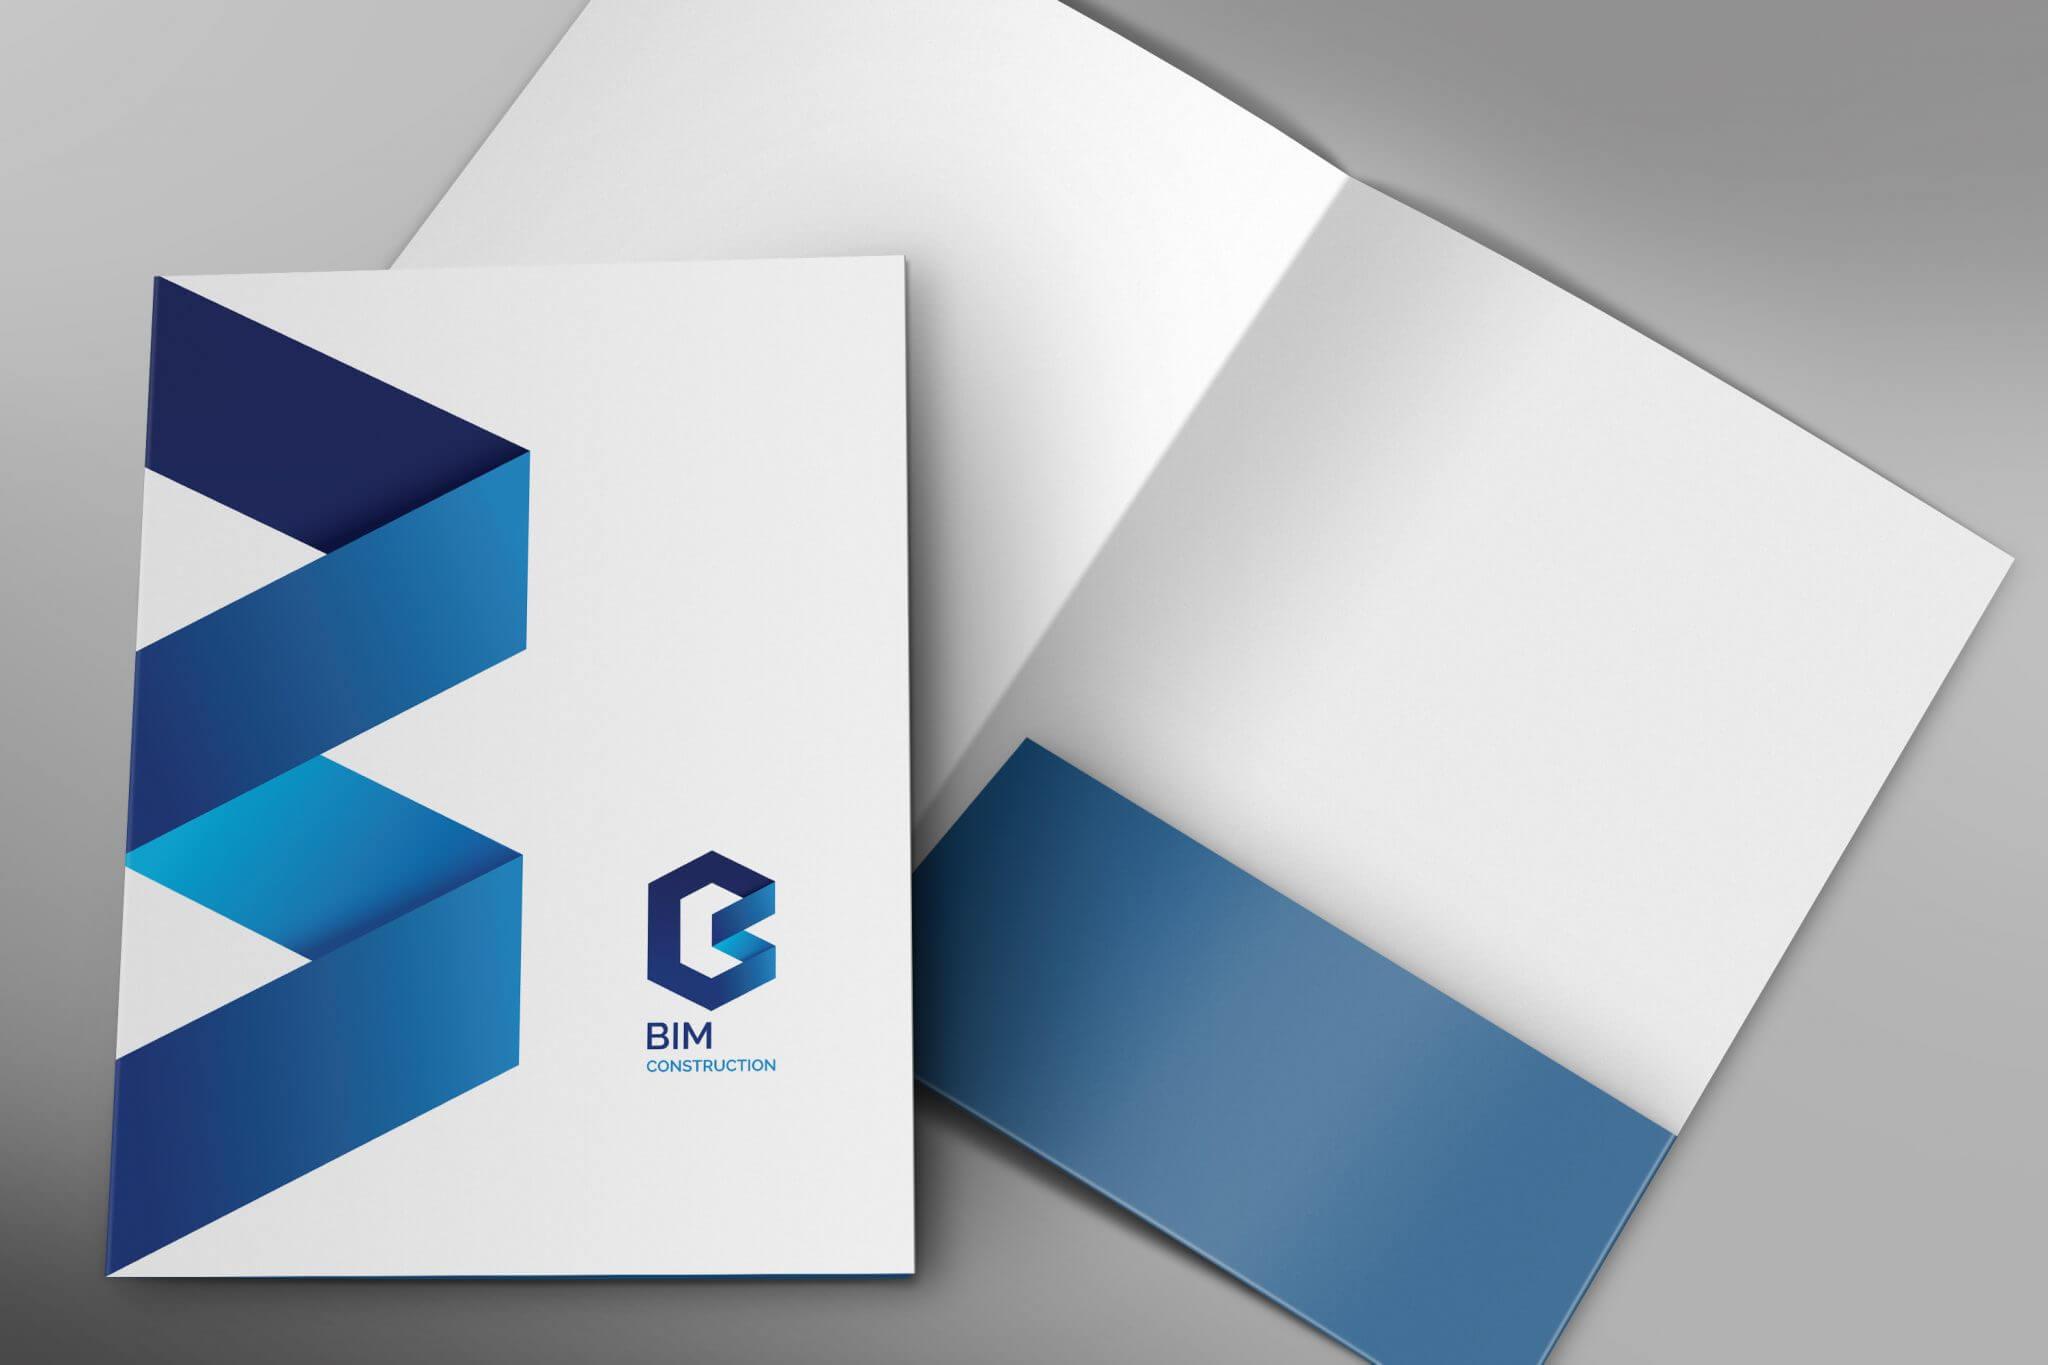 02 folder - 02-folder